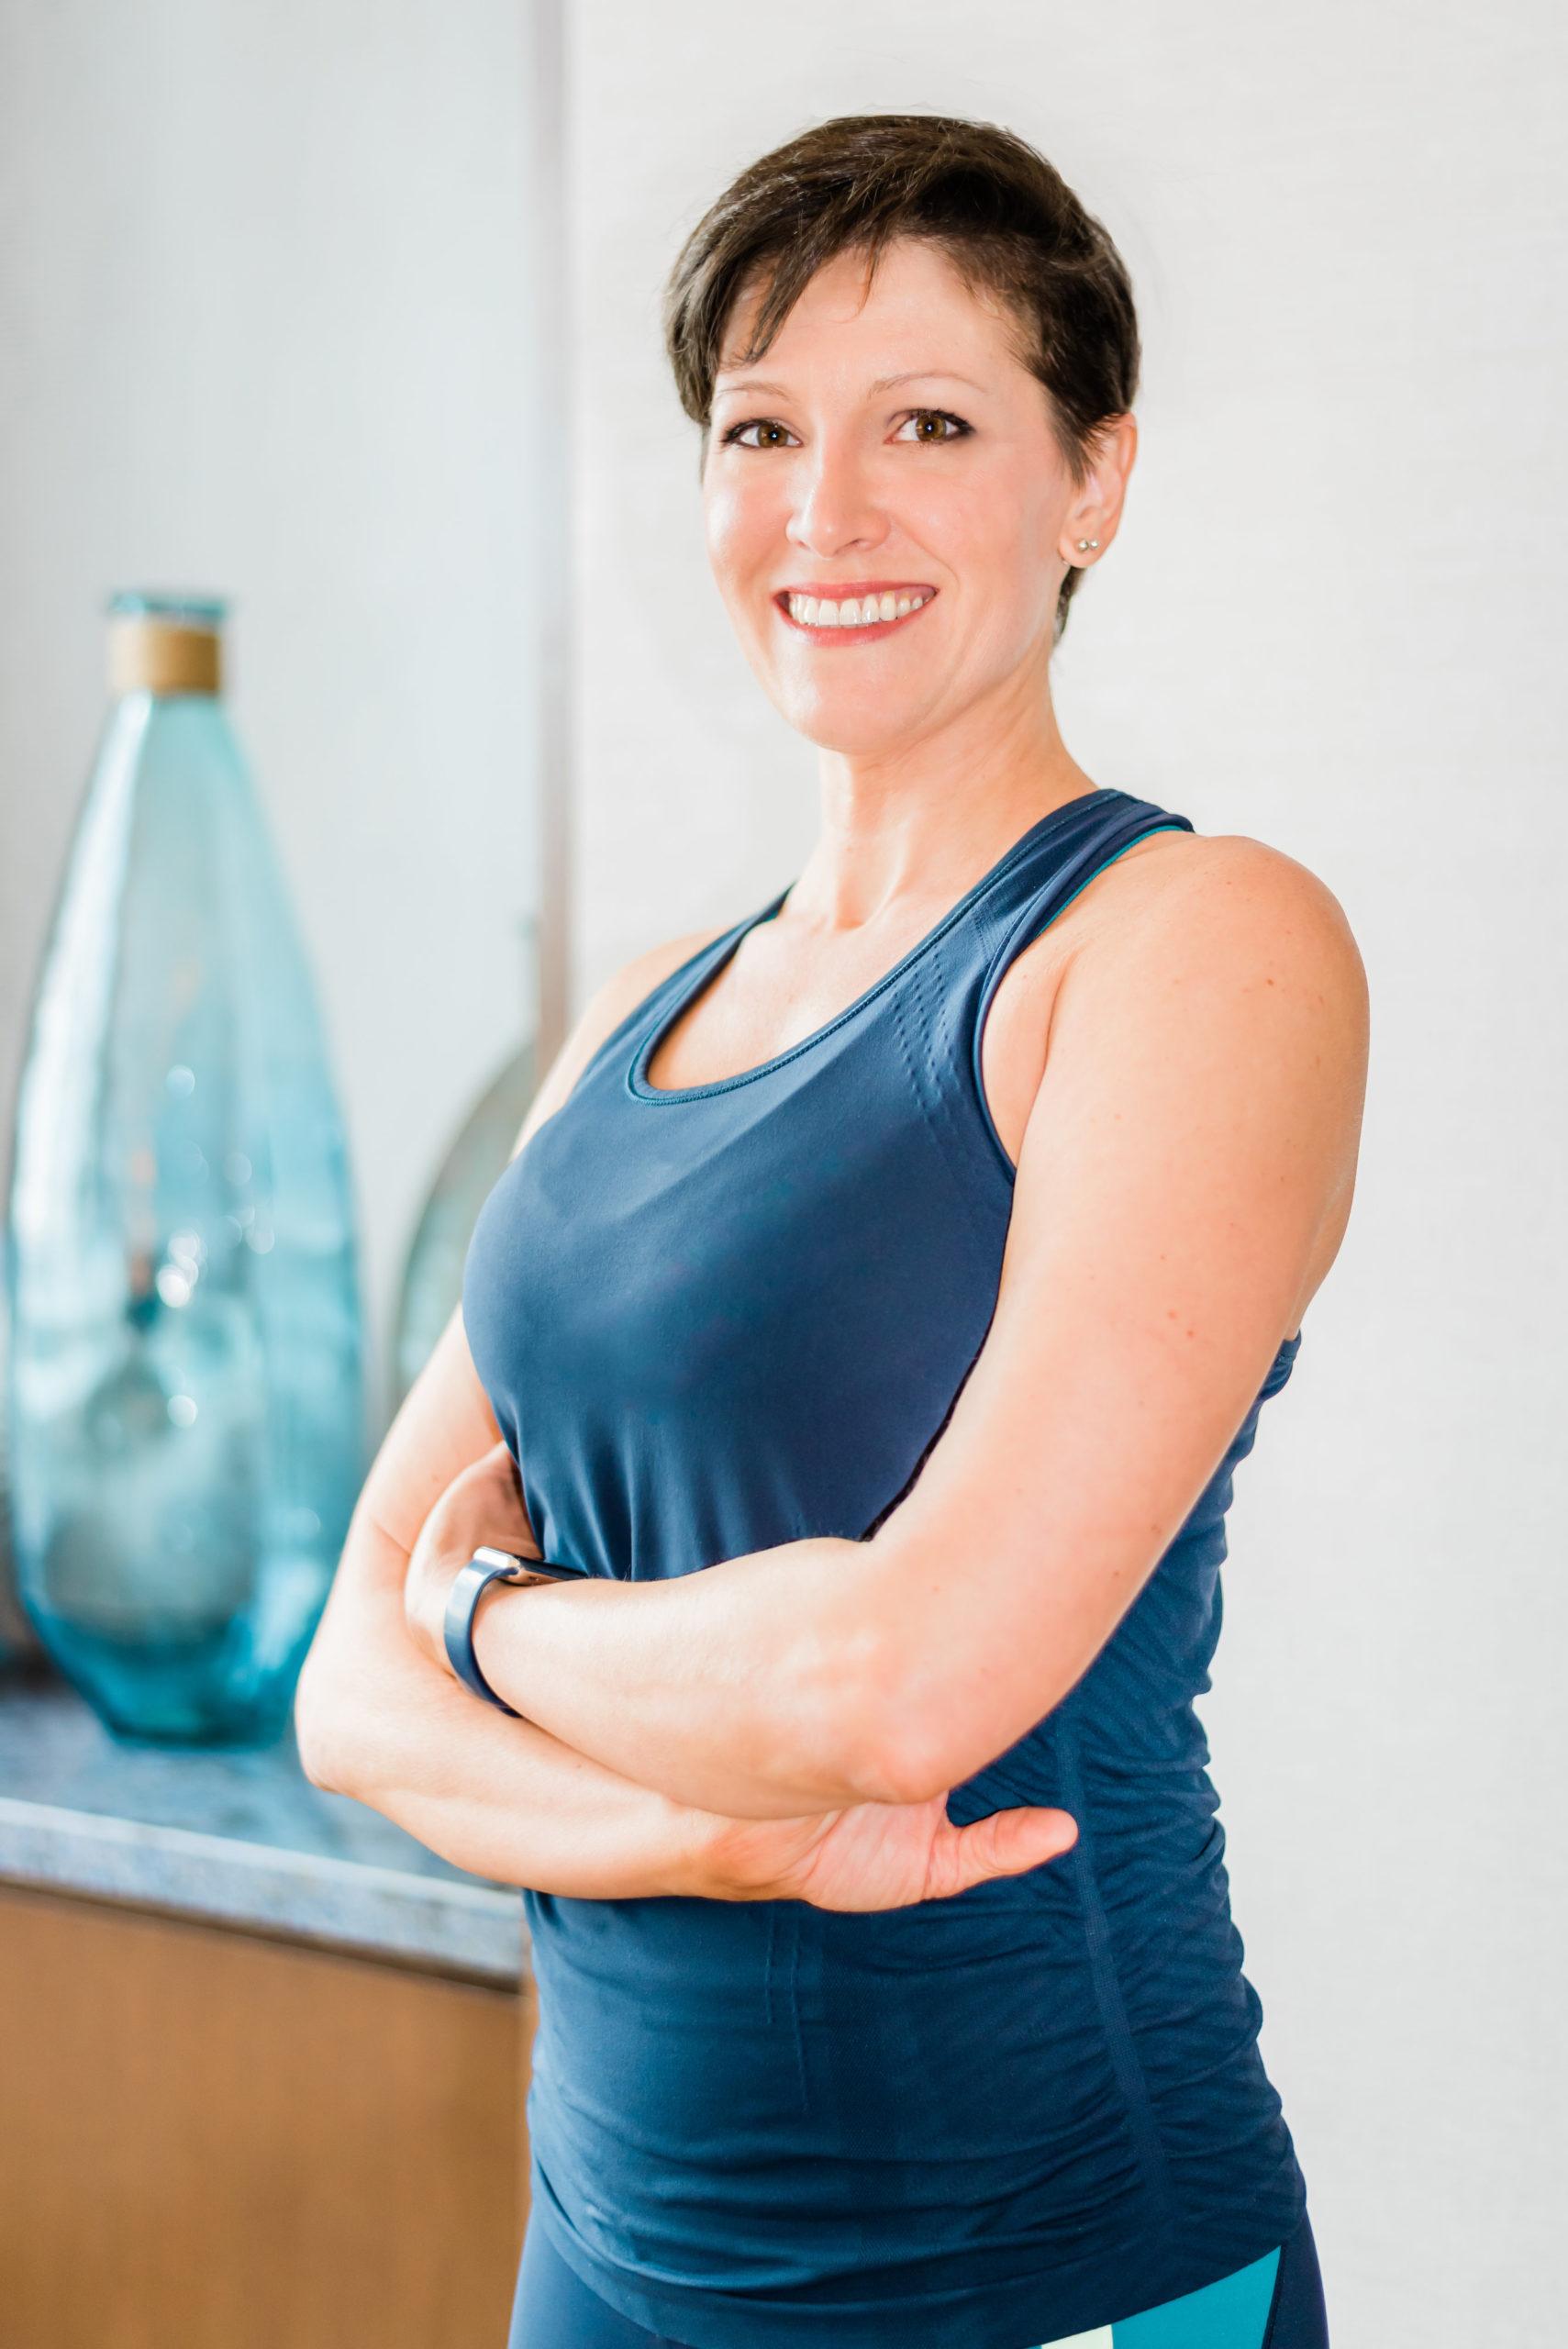 Marie Weaver, NASM Certified Personal Trainer